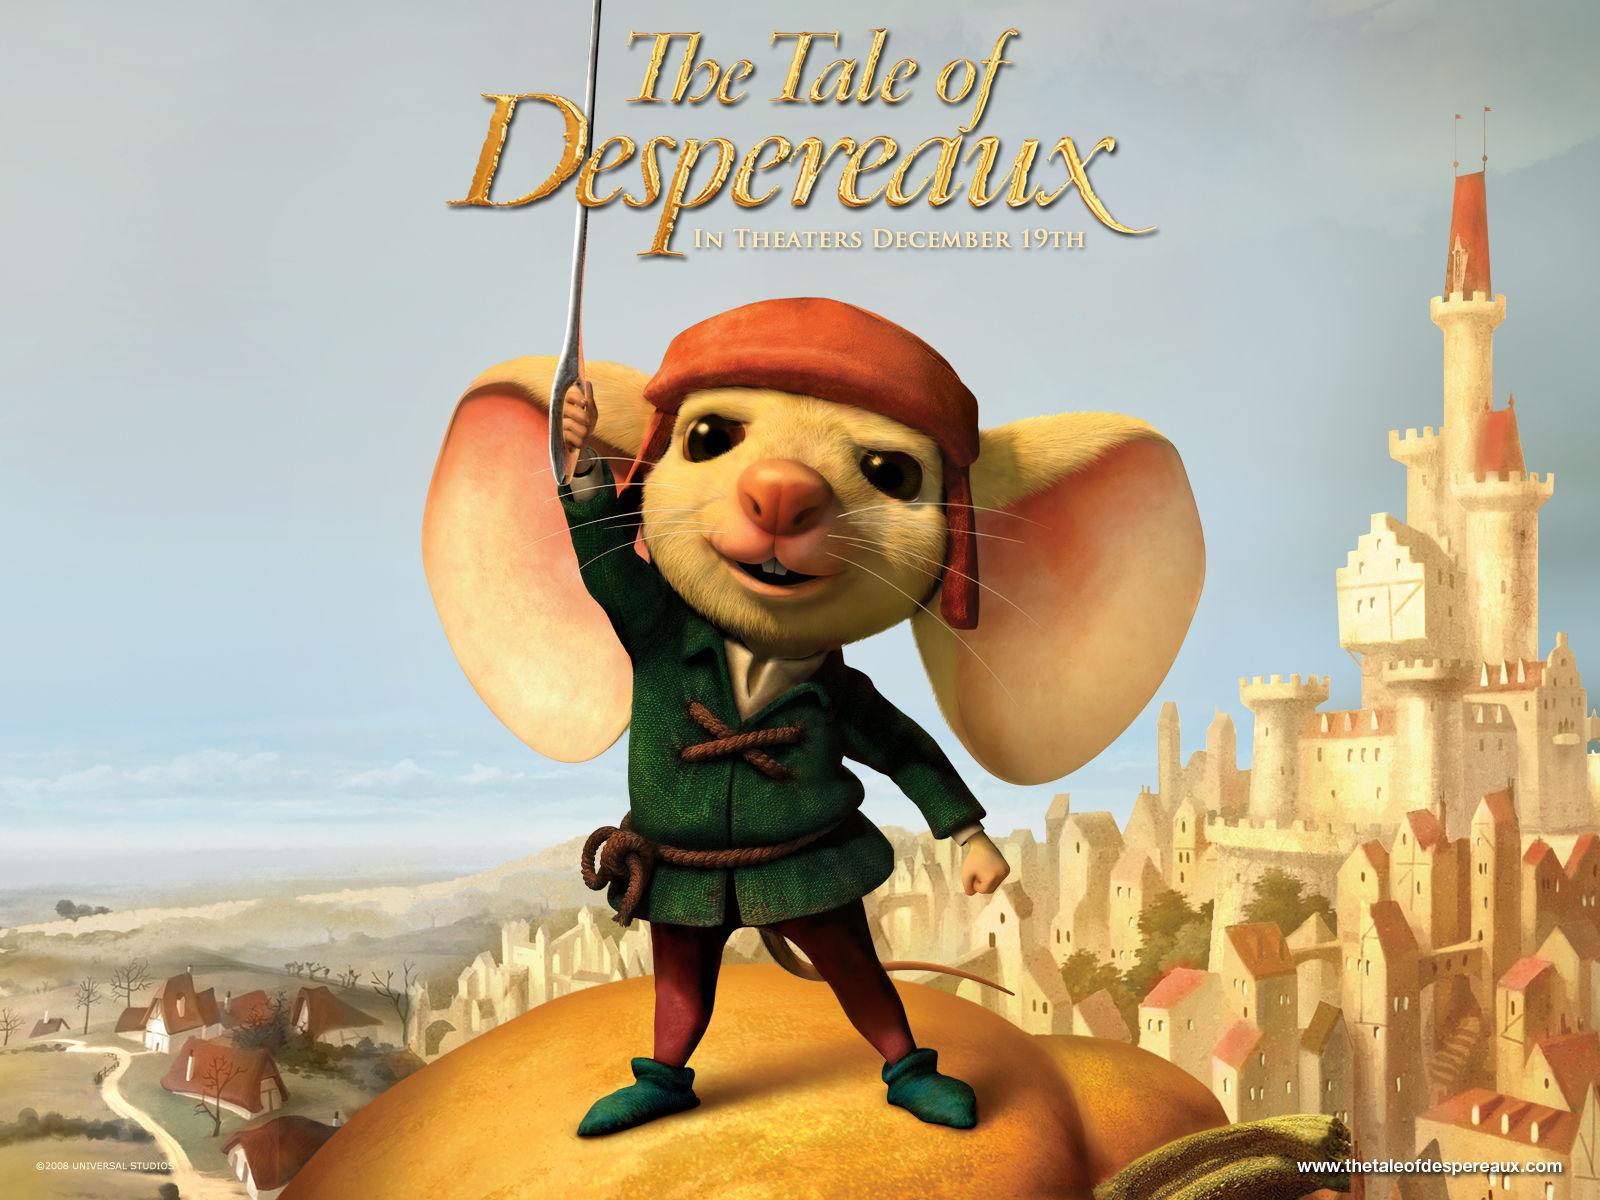 the tale of despereaux images the tale of despereaux hd